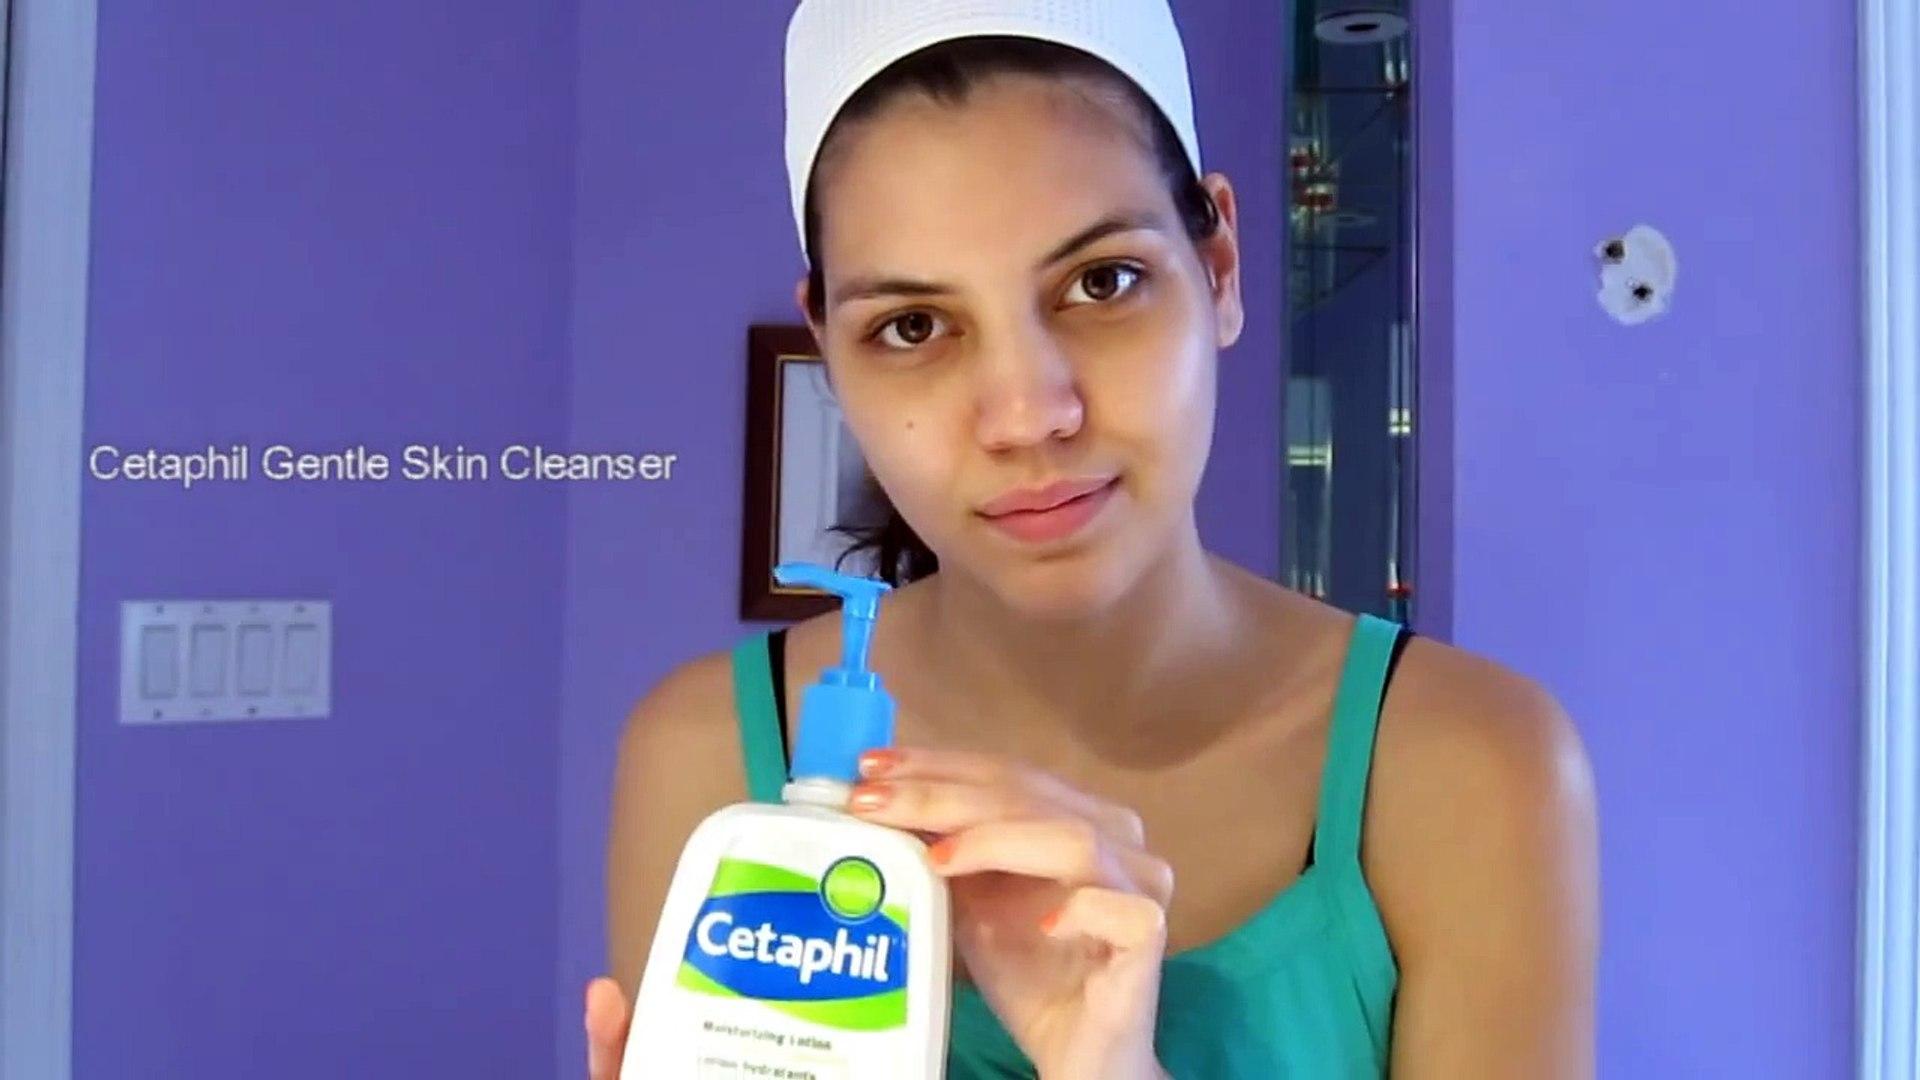 My SkinCare Routine: Cetaphil!